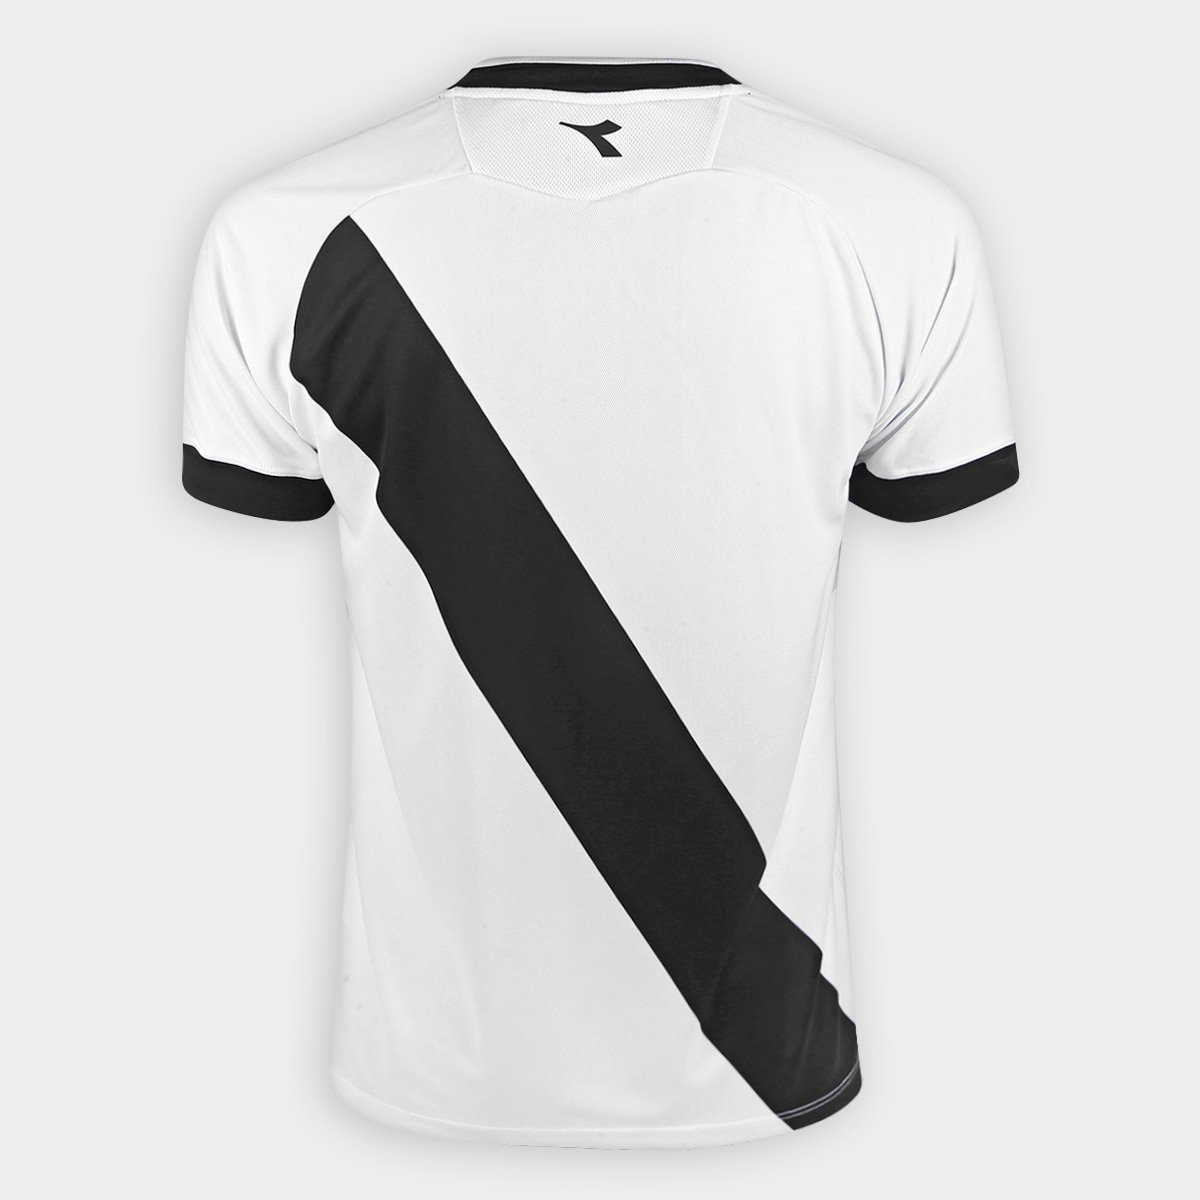 Camisa Vasco II 19 20 s n° - Torcedor Diadora Masculina - Branco ... 1cd069116a78d